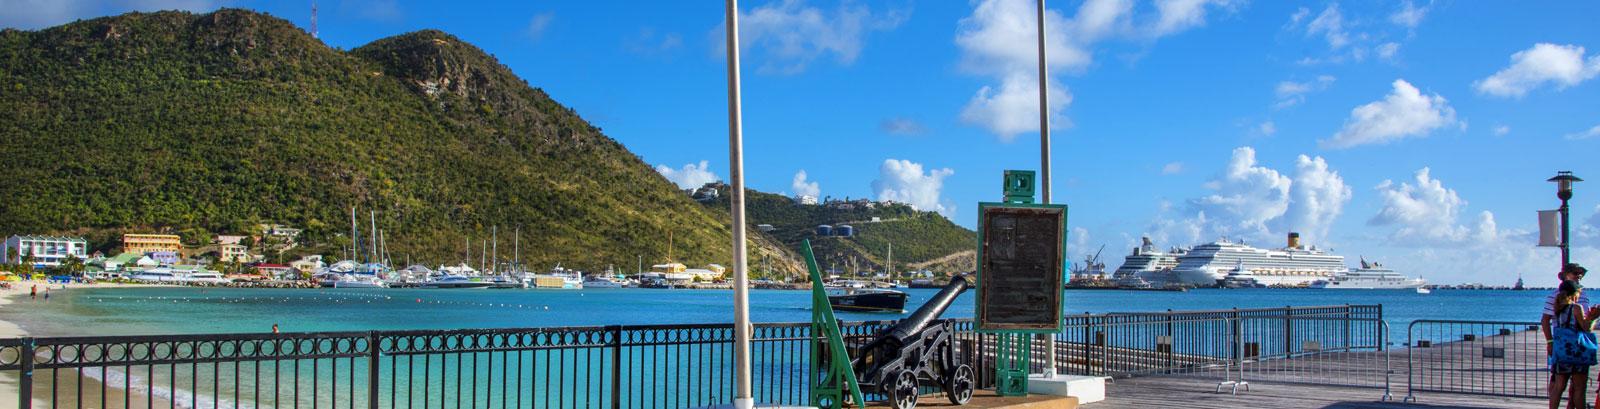 History of St. Maarten, Simpson Bay Resort, Marina & Spa